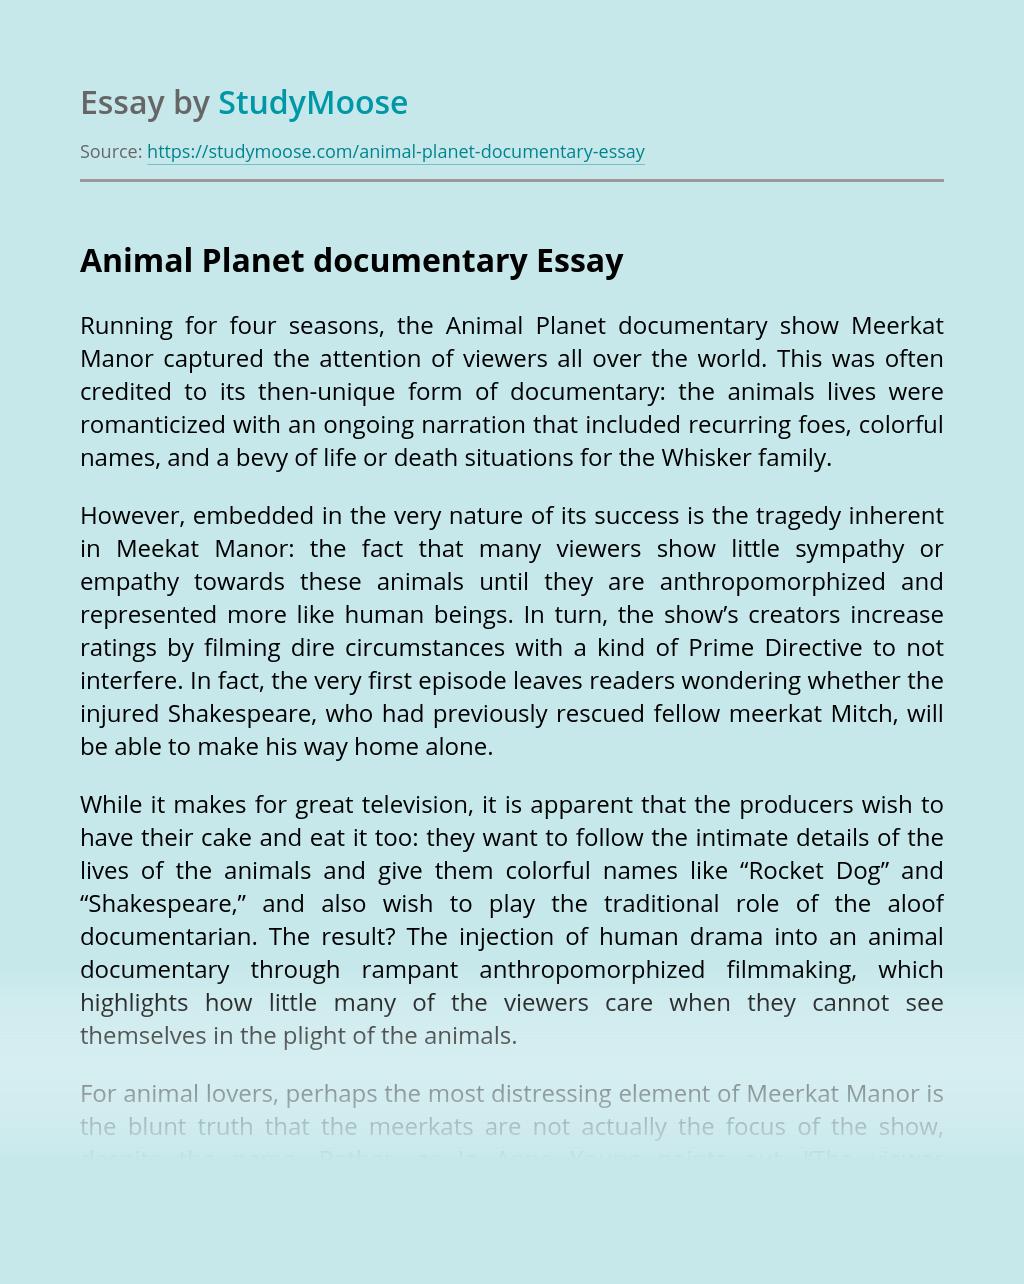 Animal Planet documentary